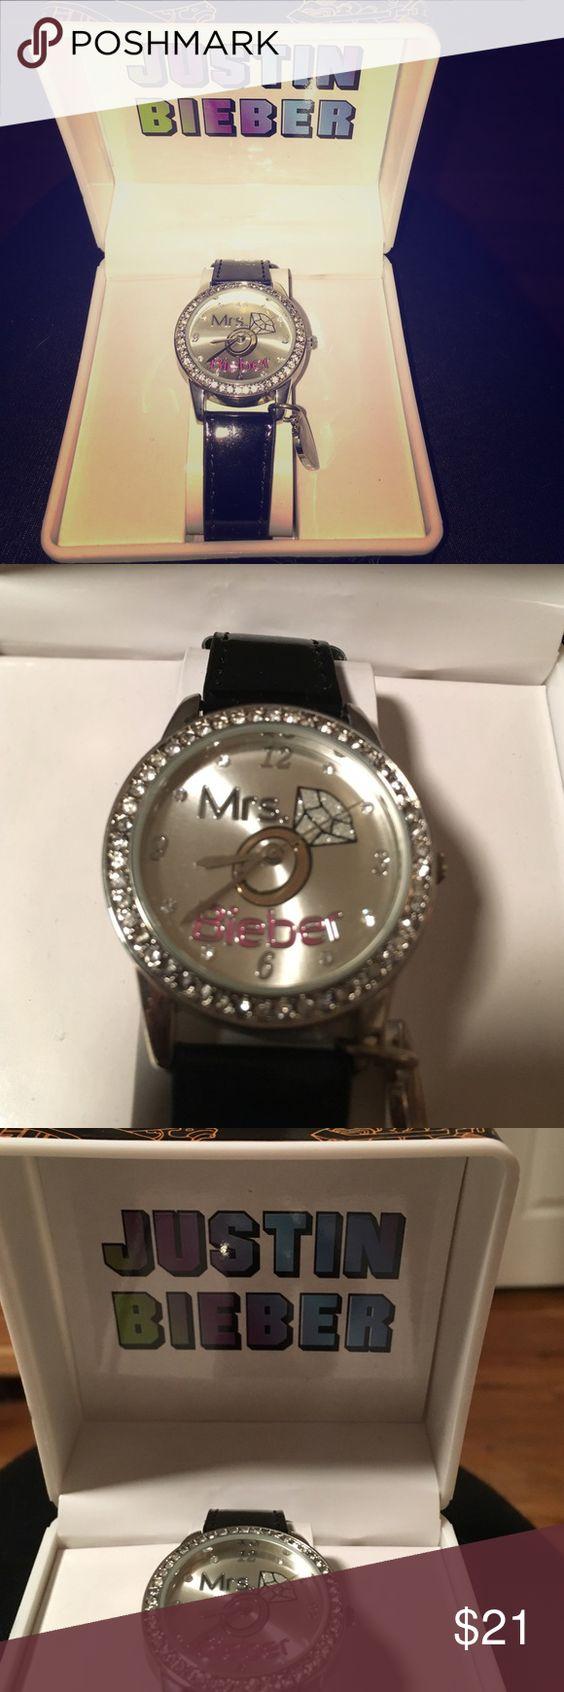 "Justin Bieber ""Mrs. Bieber"" watch ! BRAND NEW Never worn Justin Bieber watch ! justin bieber Accessories Watches"